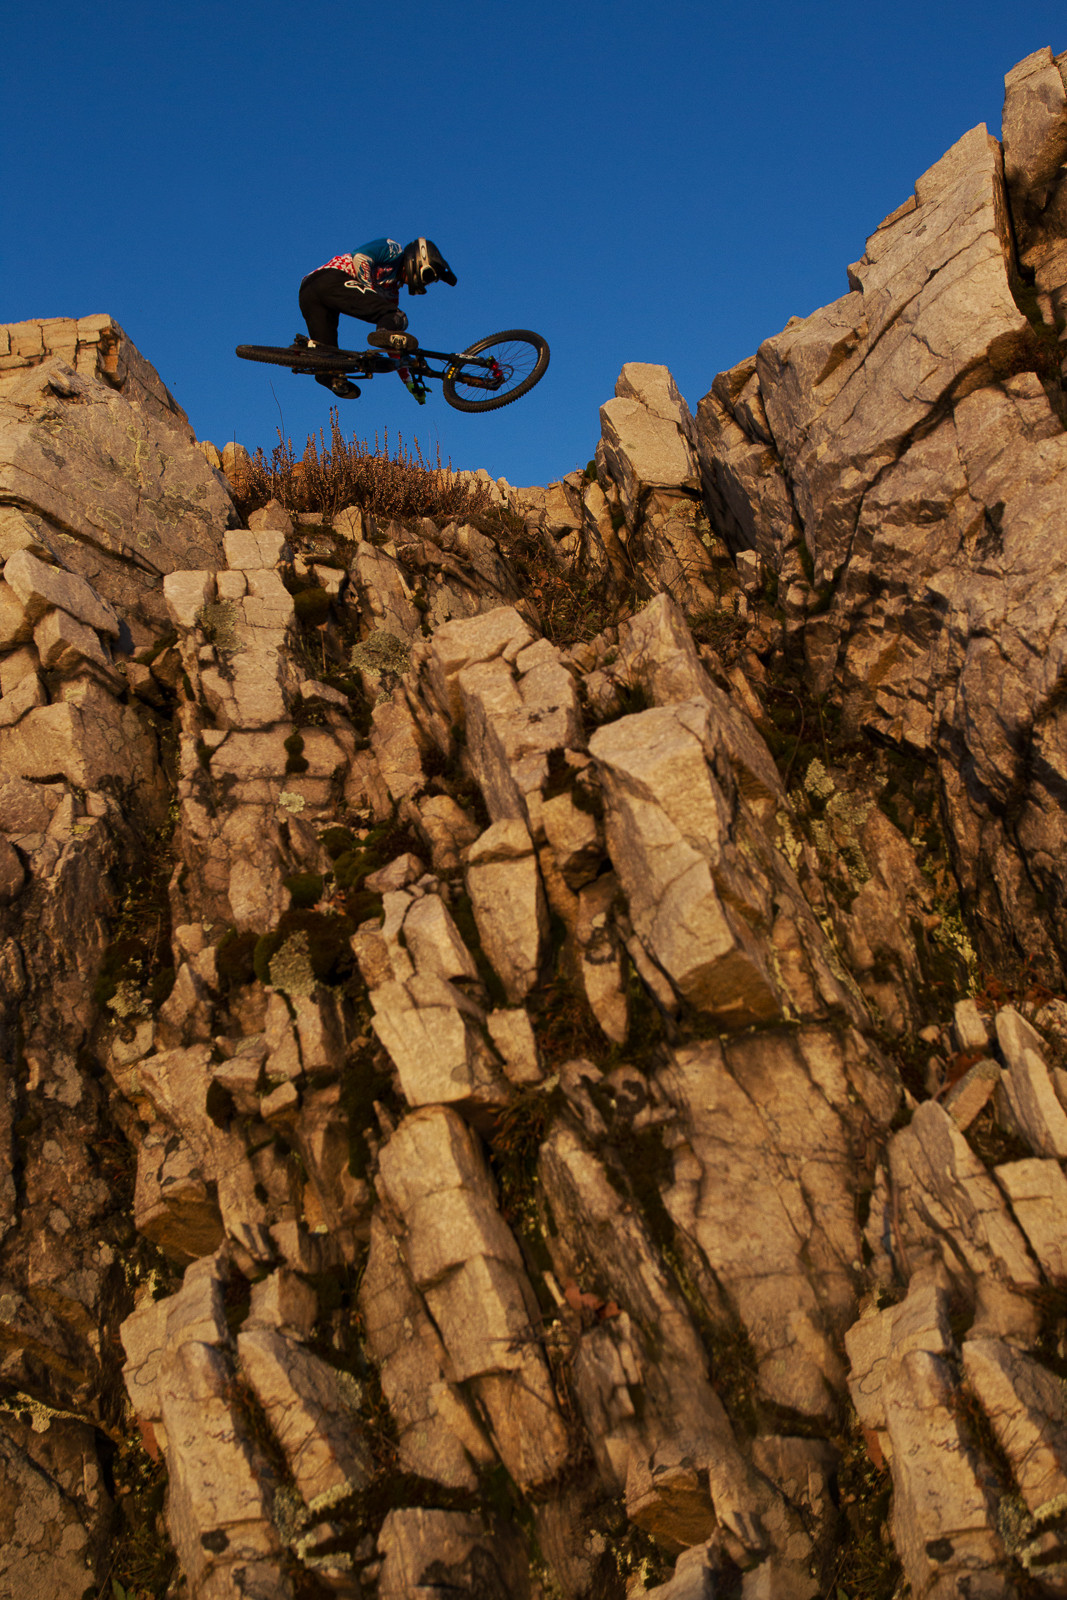 Jakub - EWIA - Mountain Biking Pictures - Vital MTB